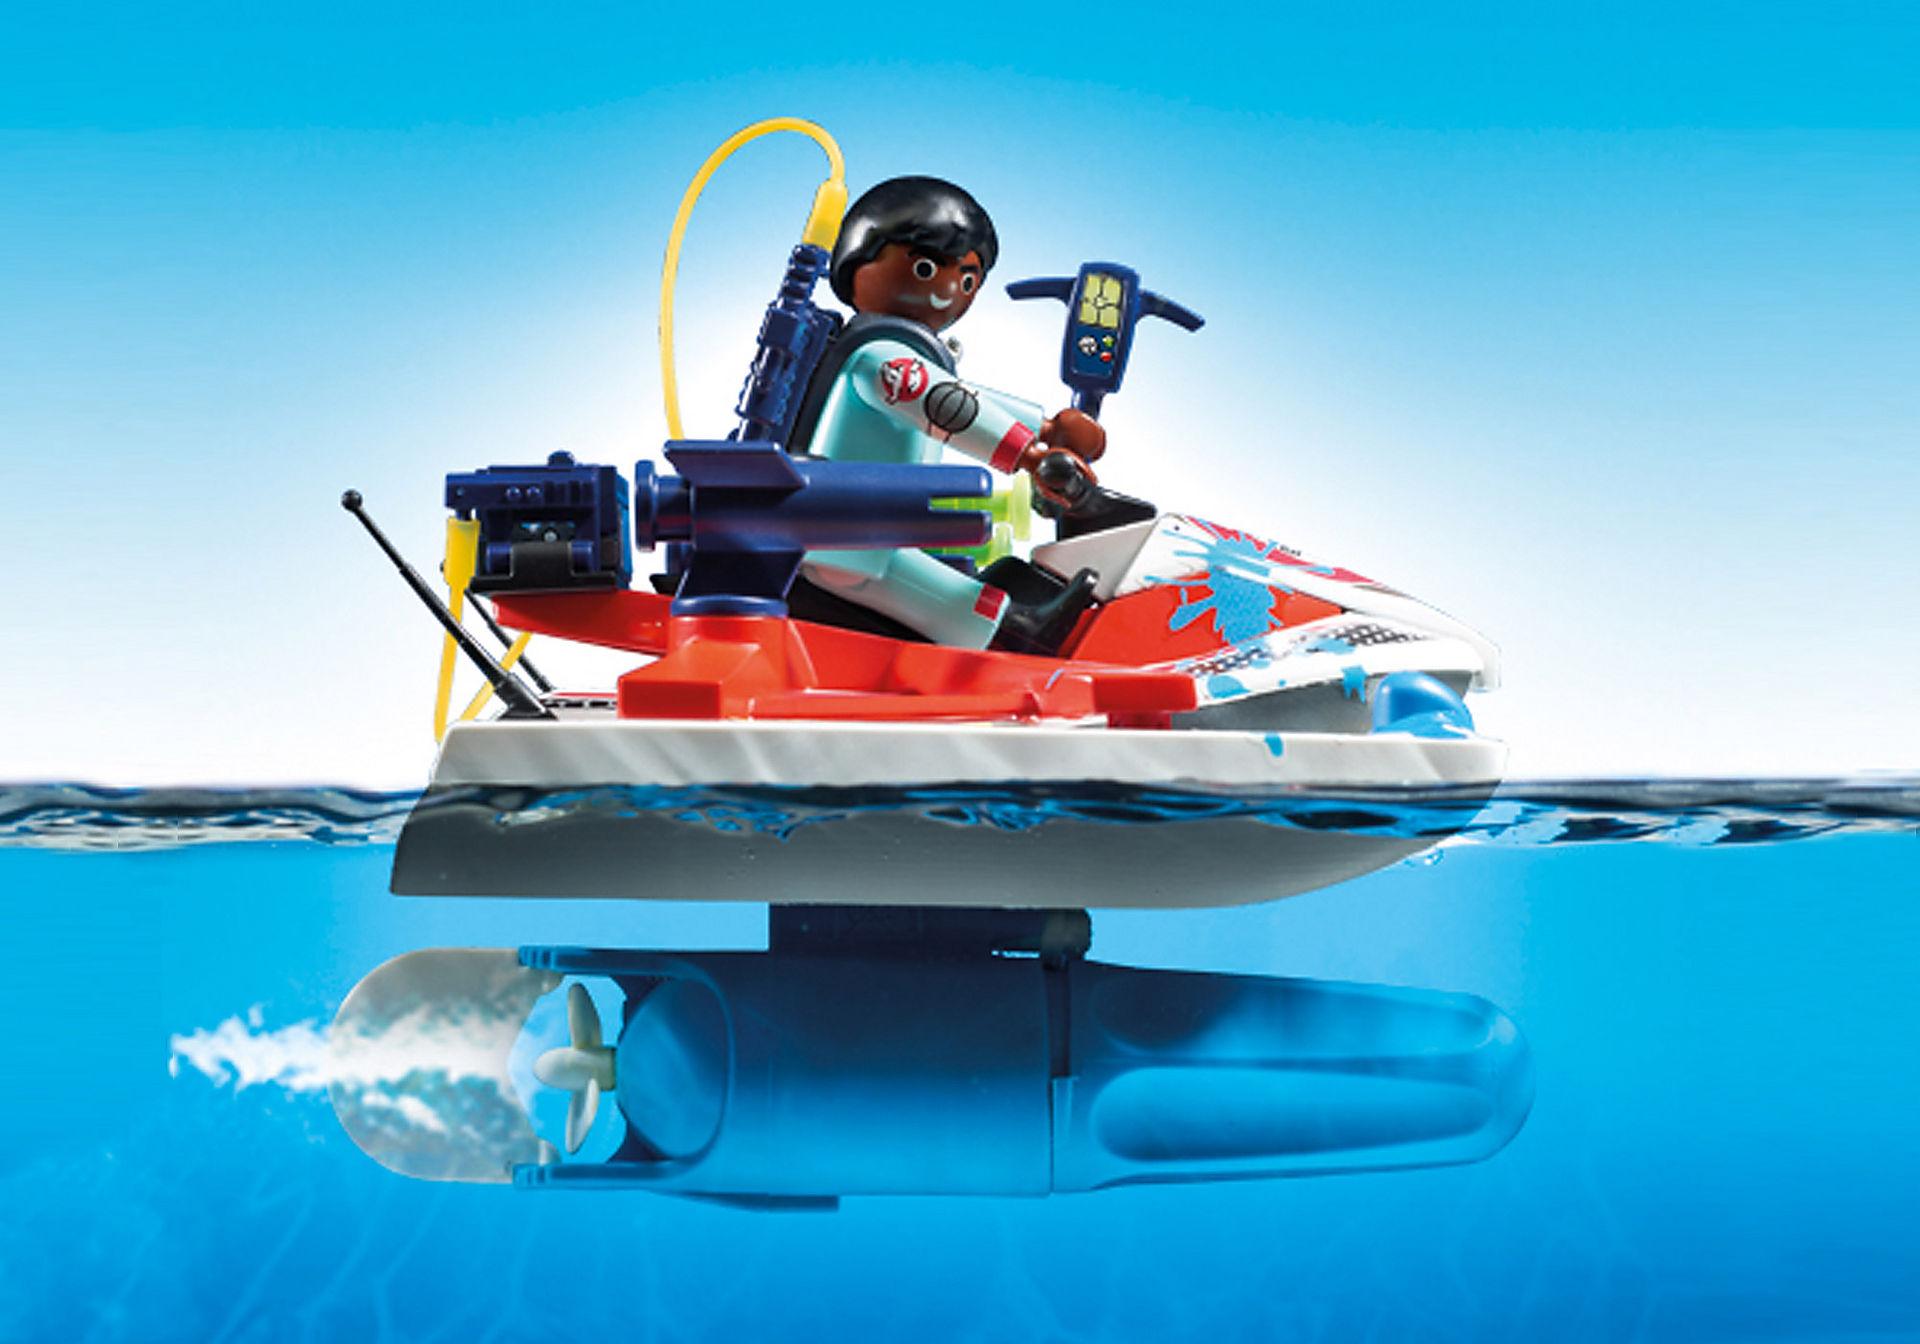 http://media.playmobil.com/i/playmobil/9387_product_extra3/Zeddemore mit Aqua Scooter